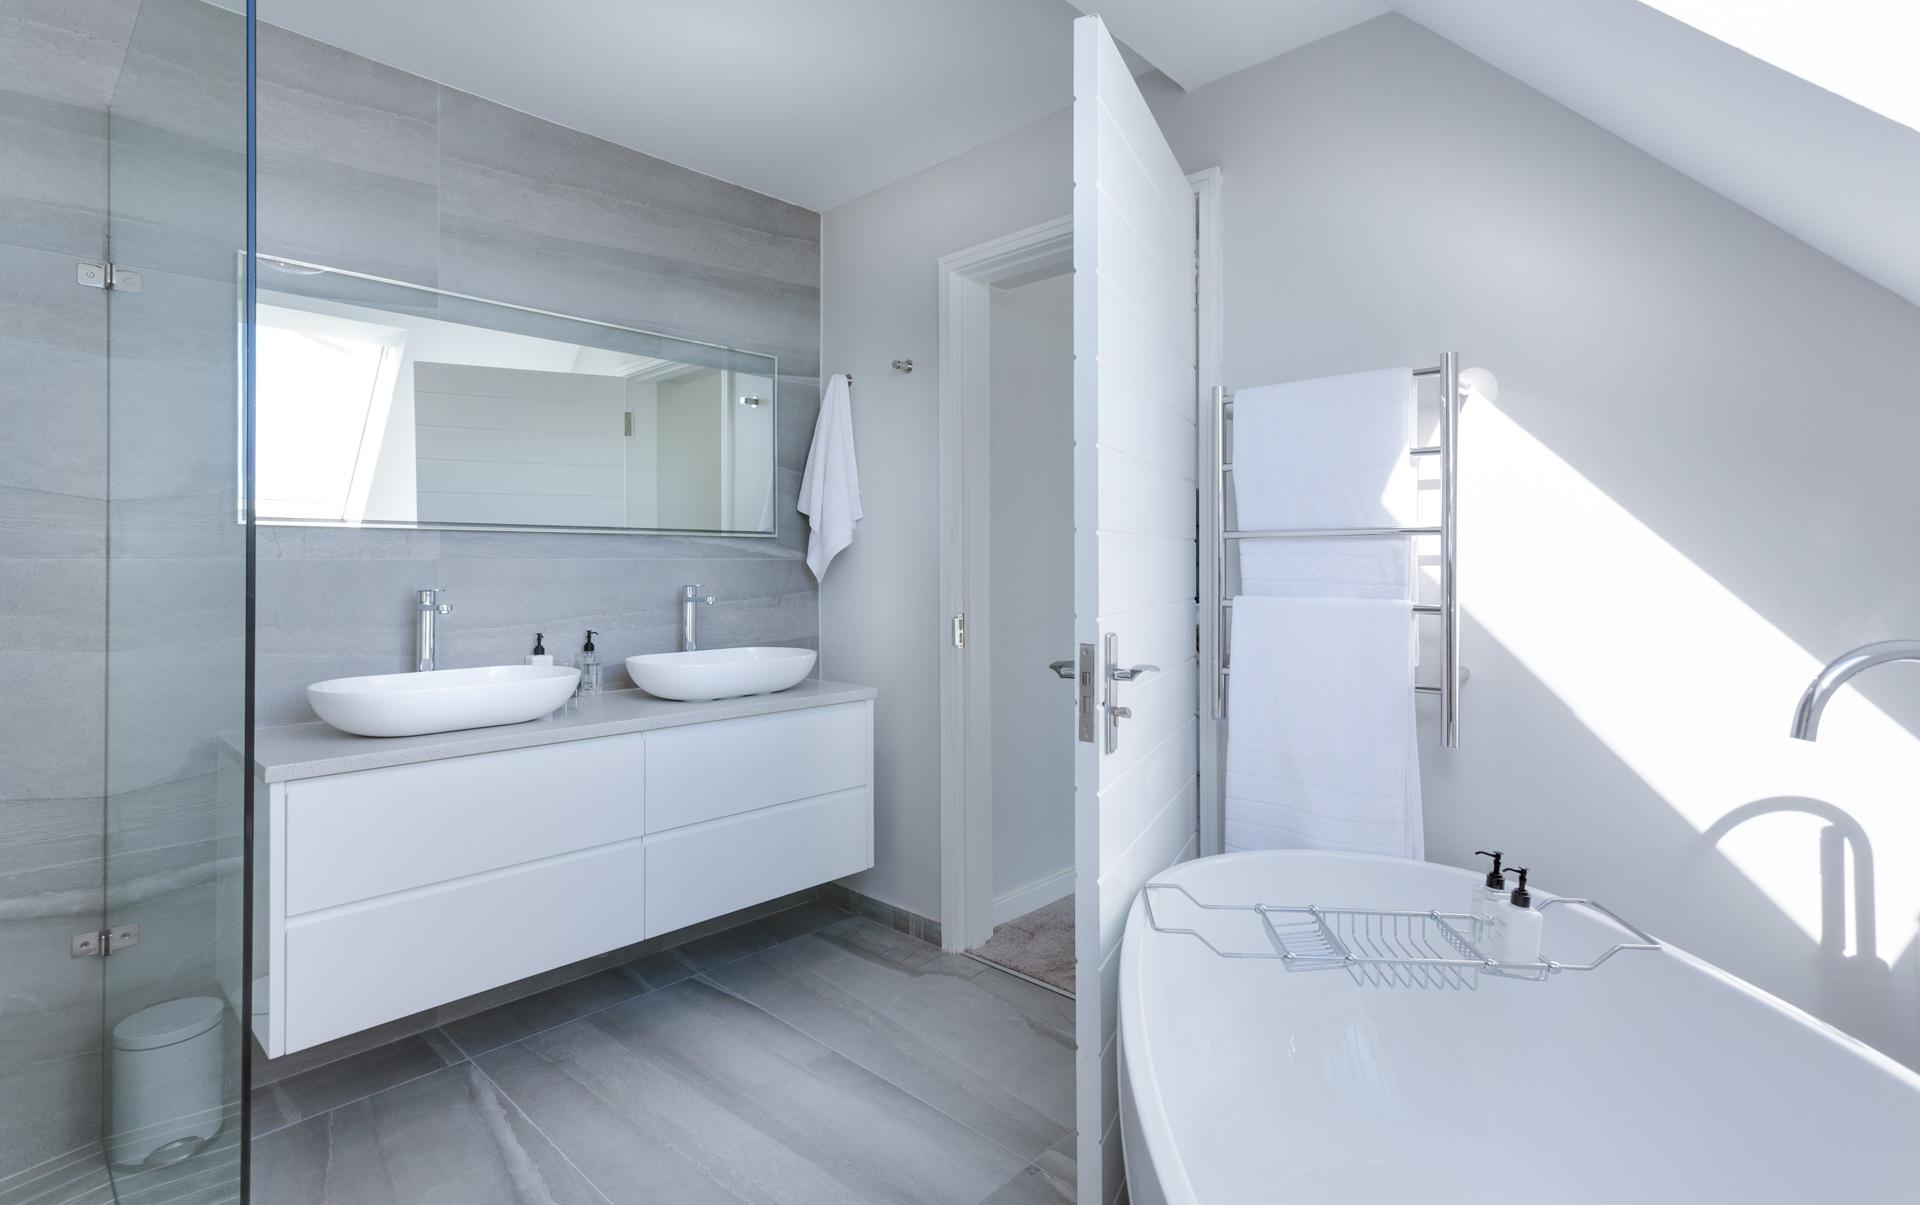 Salle de bain clé en main Rennes - Installation, rénovation, neuf